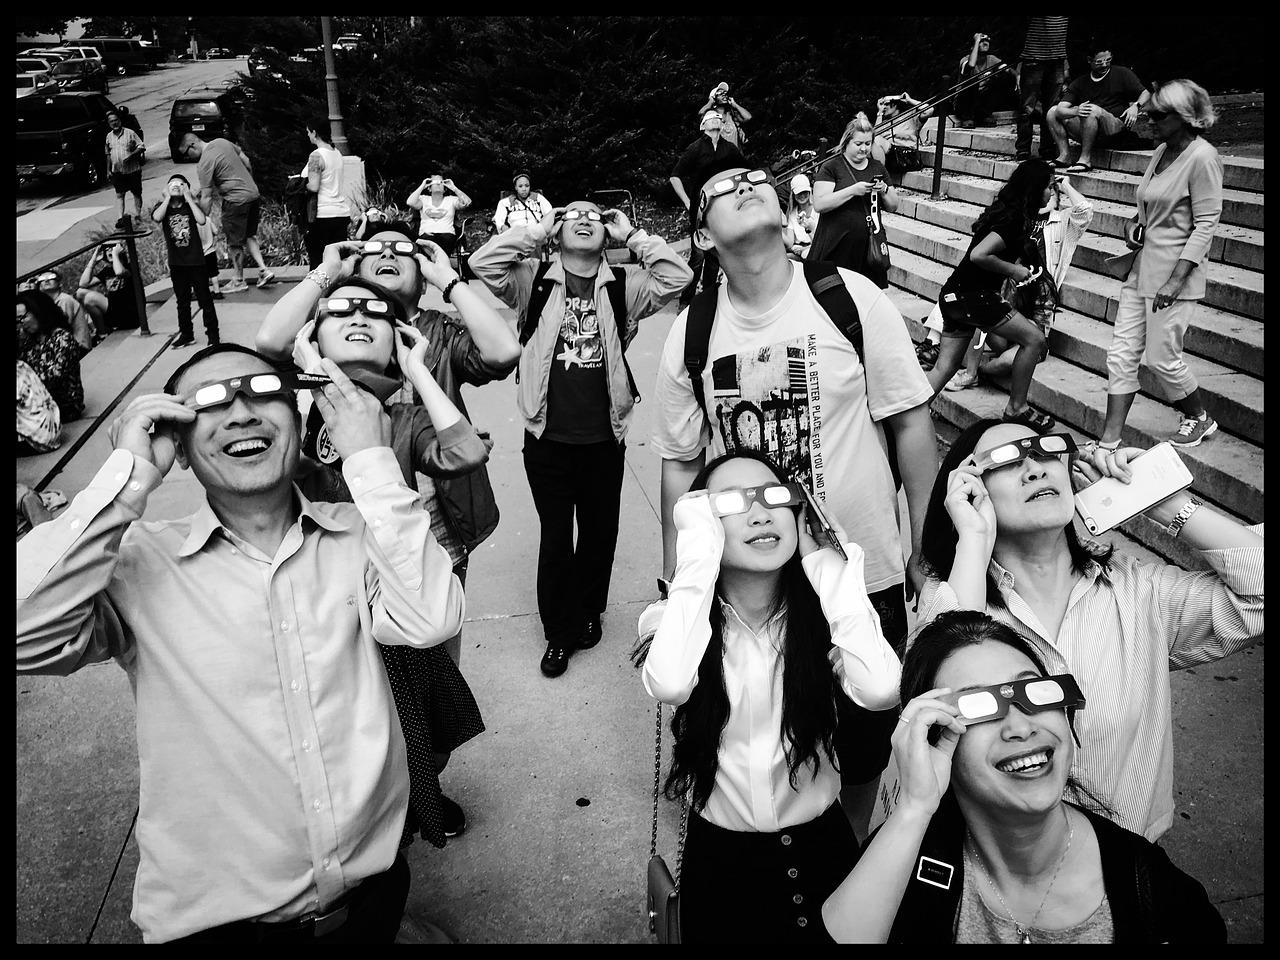 eclipse, solar eclipse, glasses